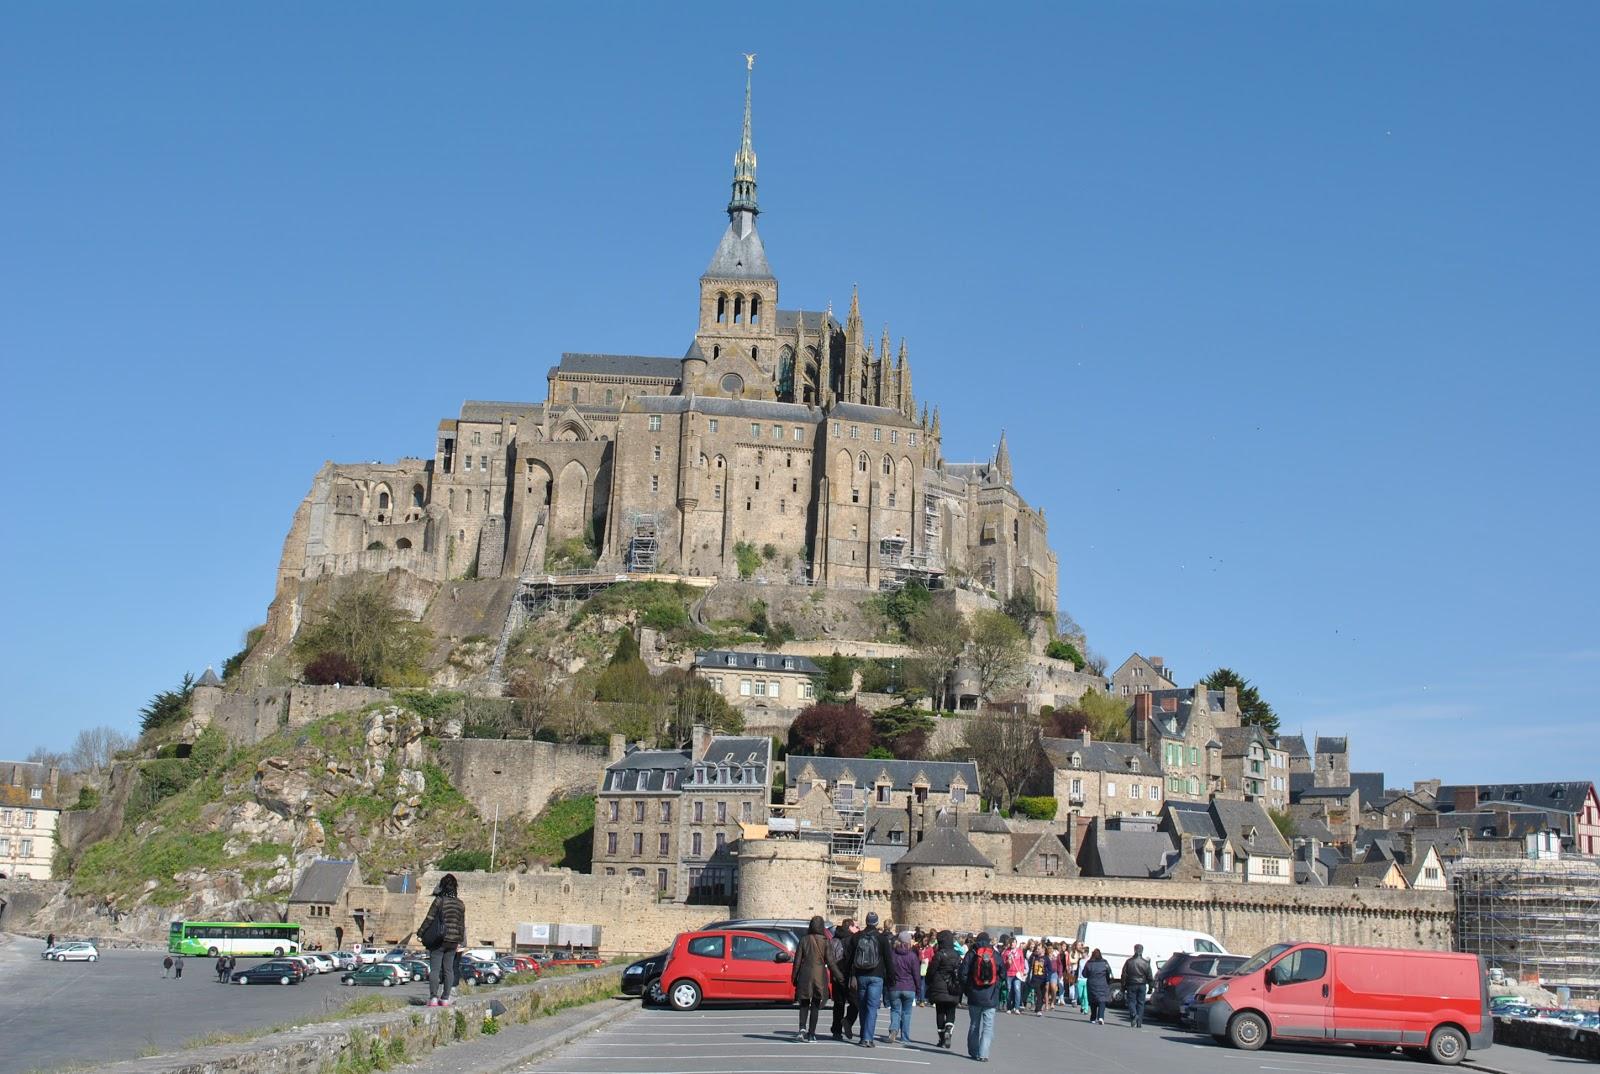 Mrupupup S Blog Travels Mount Saint Michel France